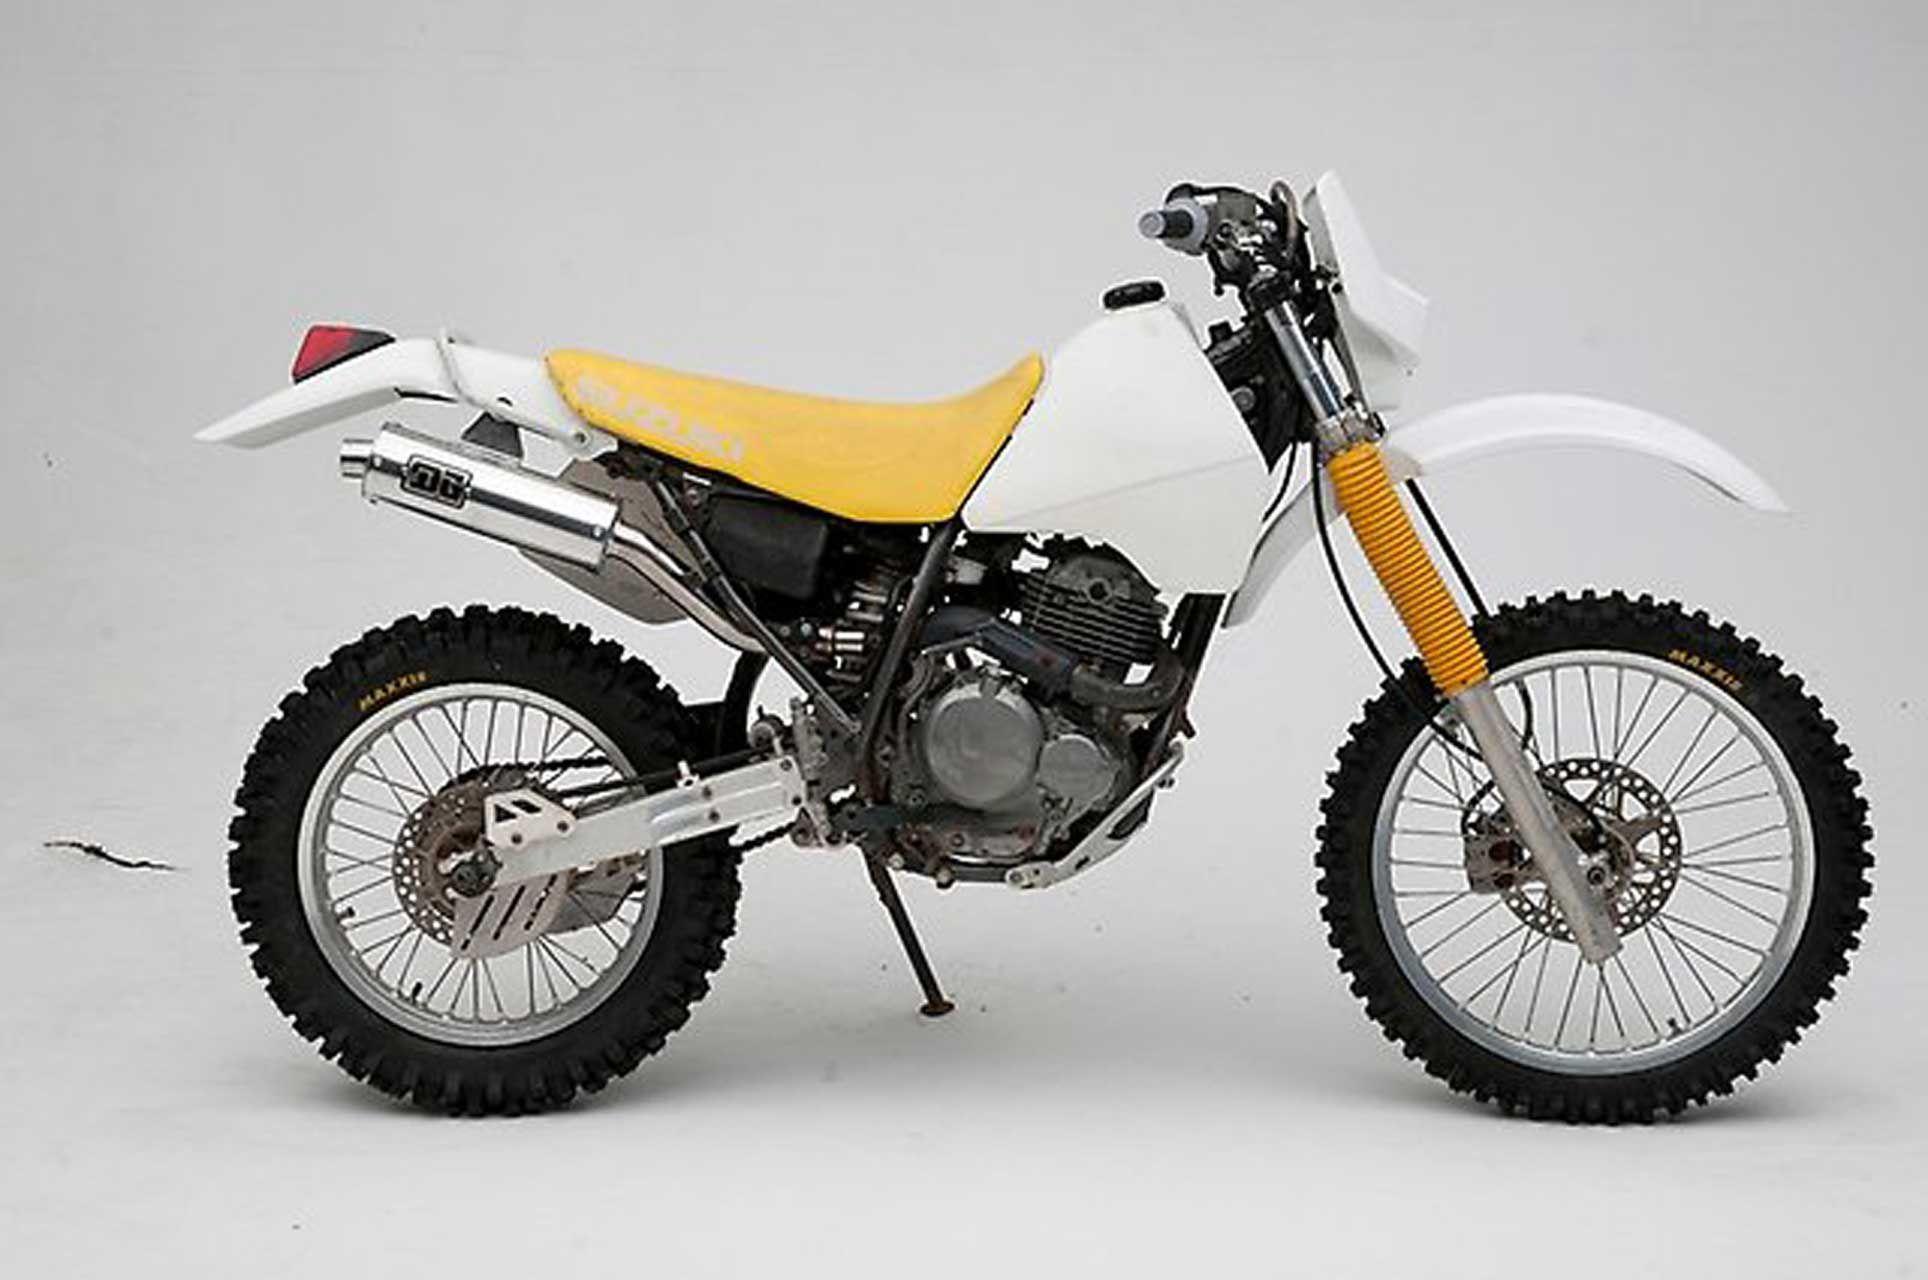 suzuki dr 350 r Motorbikes, Motorcycle parts, Motorcycle